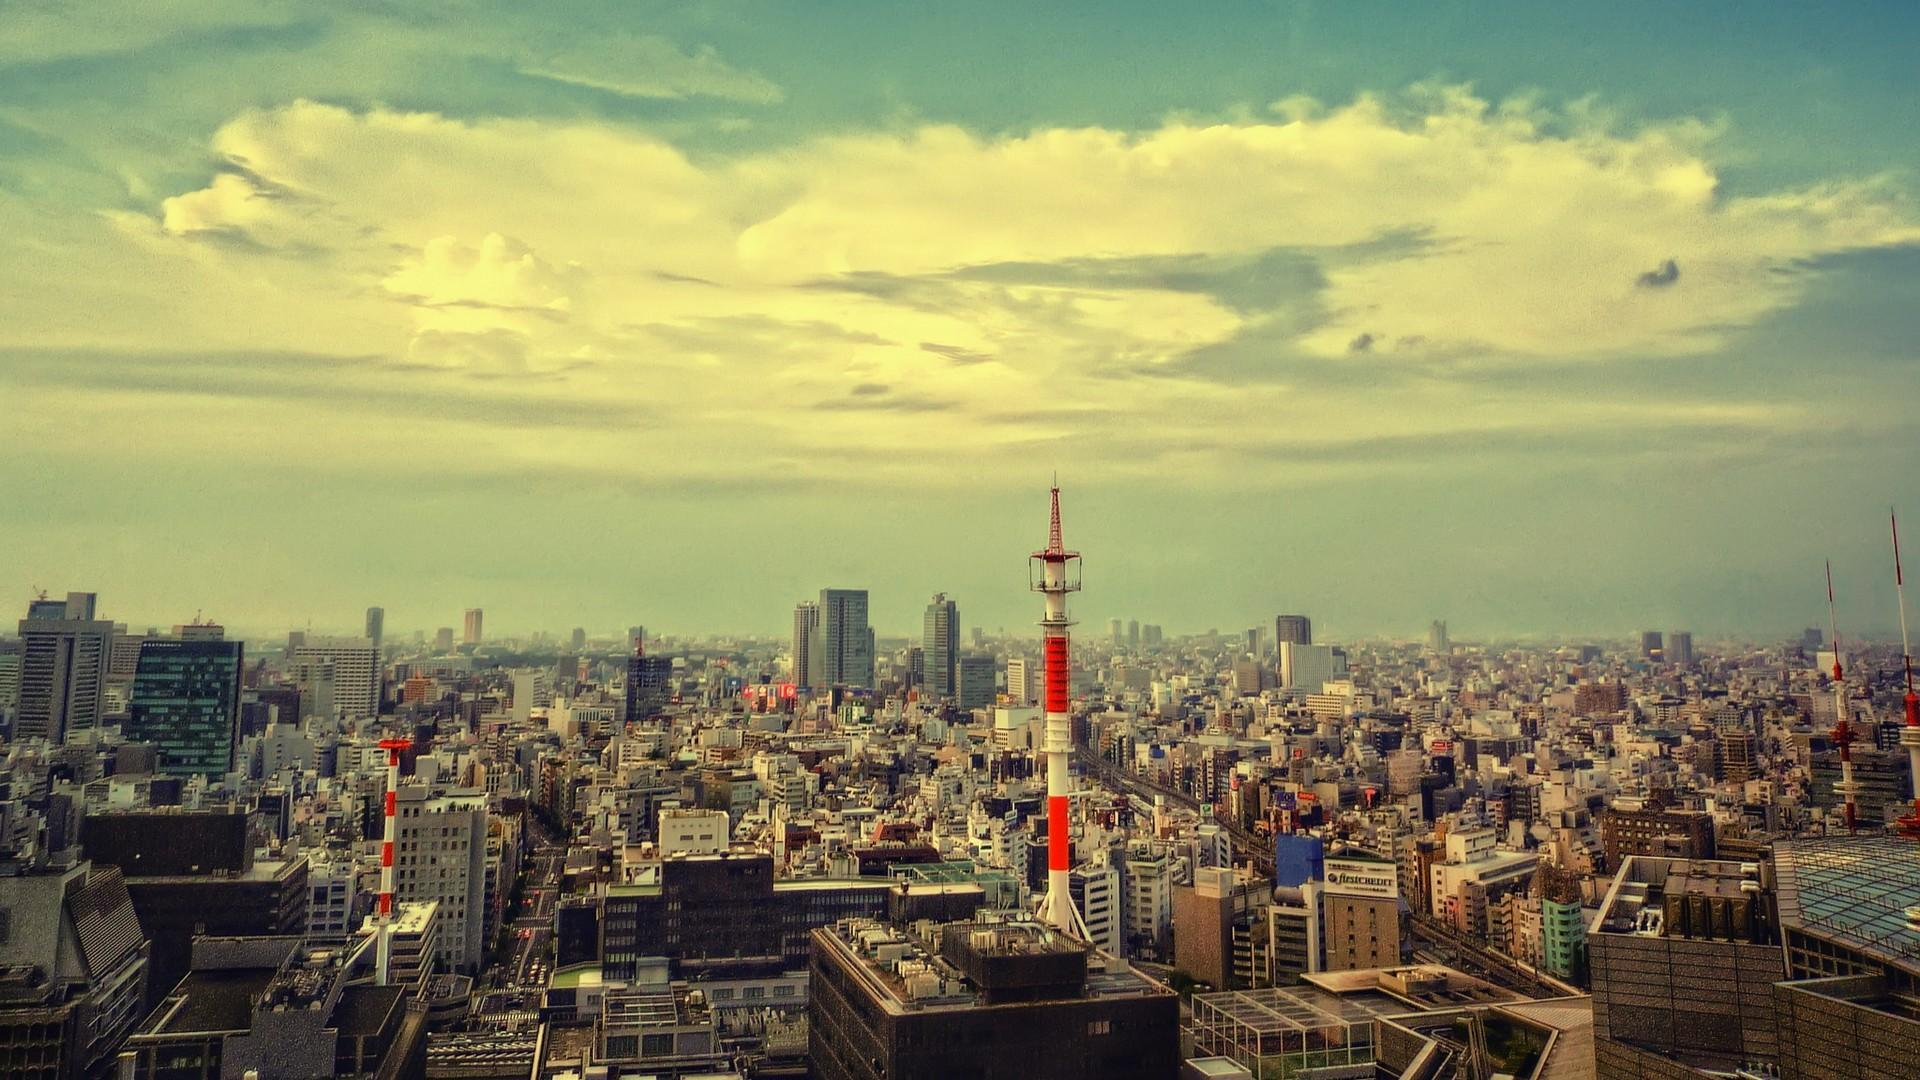 landscape City Skyline Wallpapers